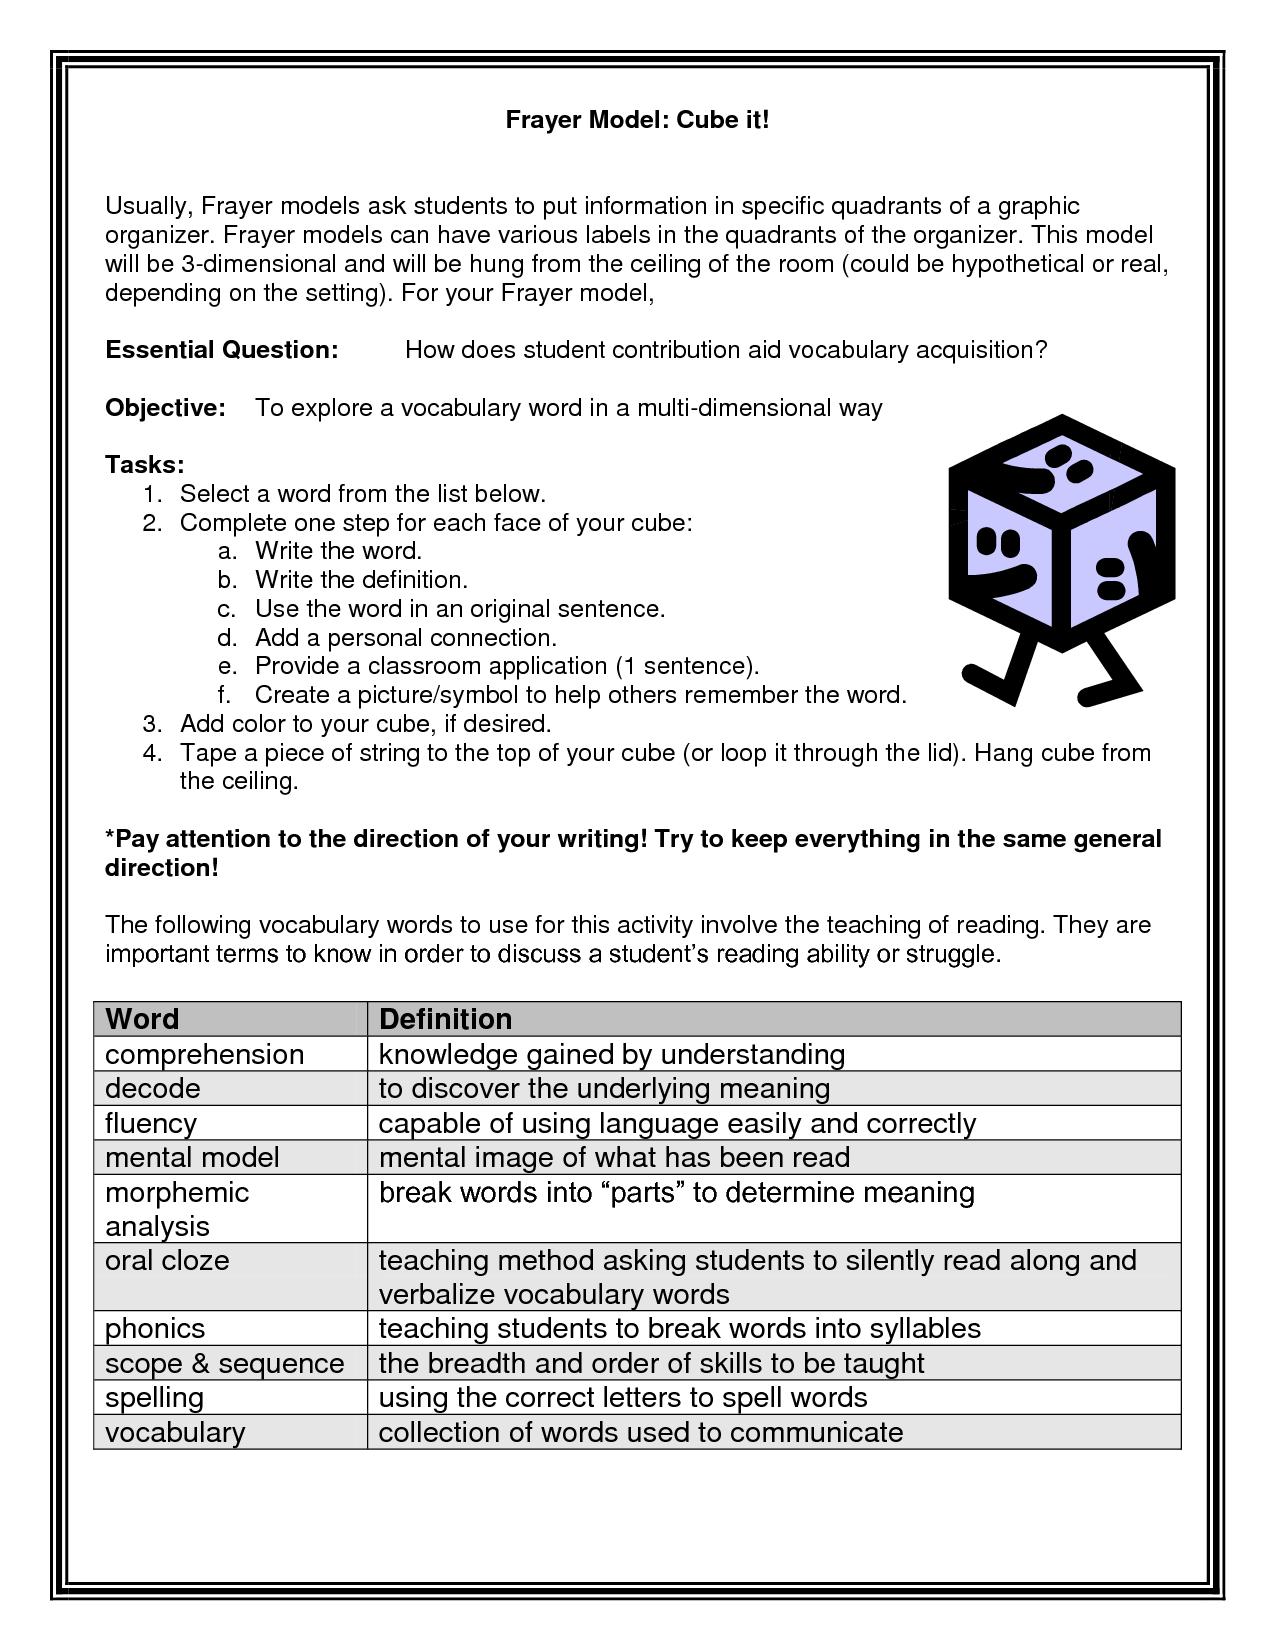 Frayer Model Template Word | Frayer Model: Cube it | school (general ...